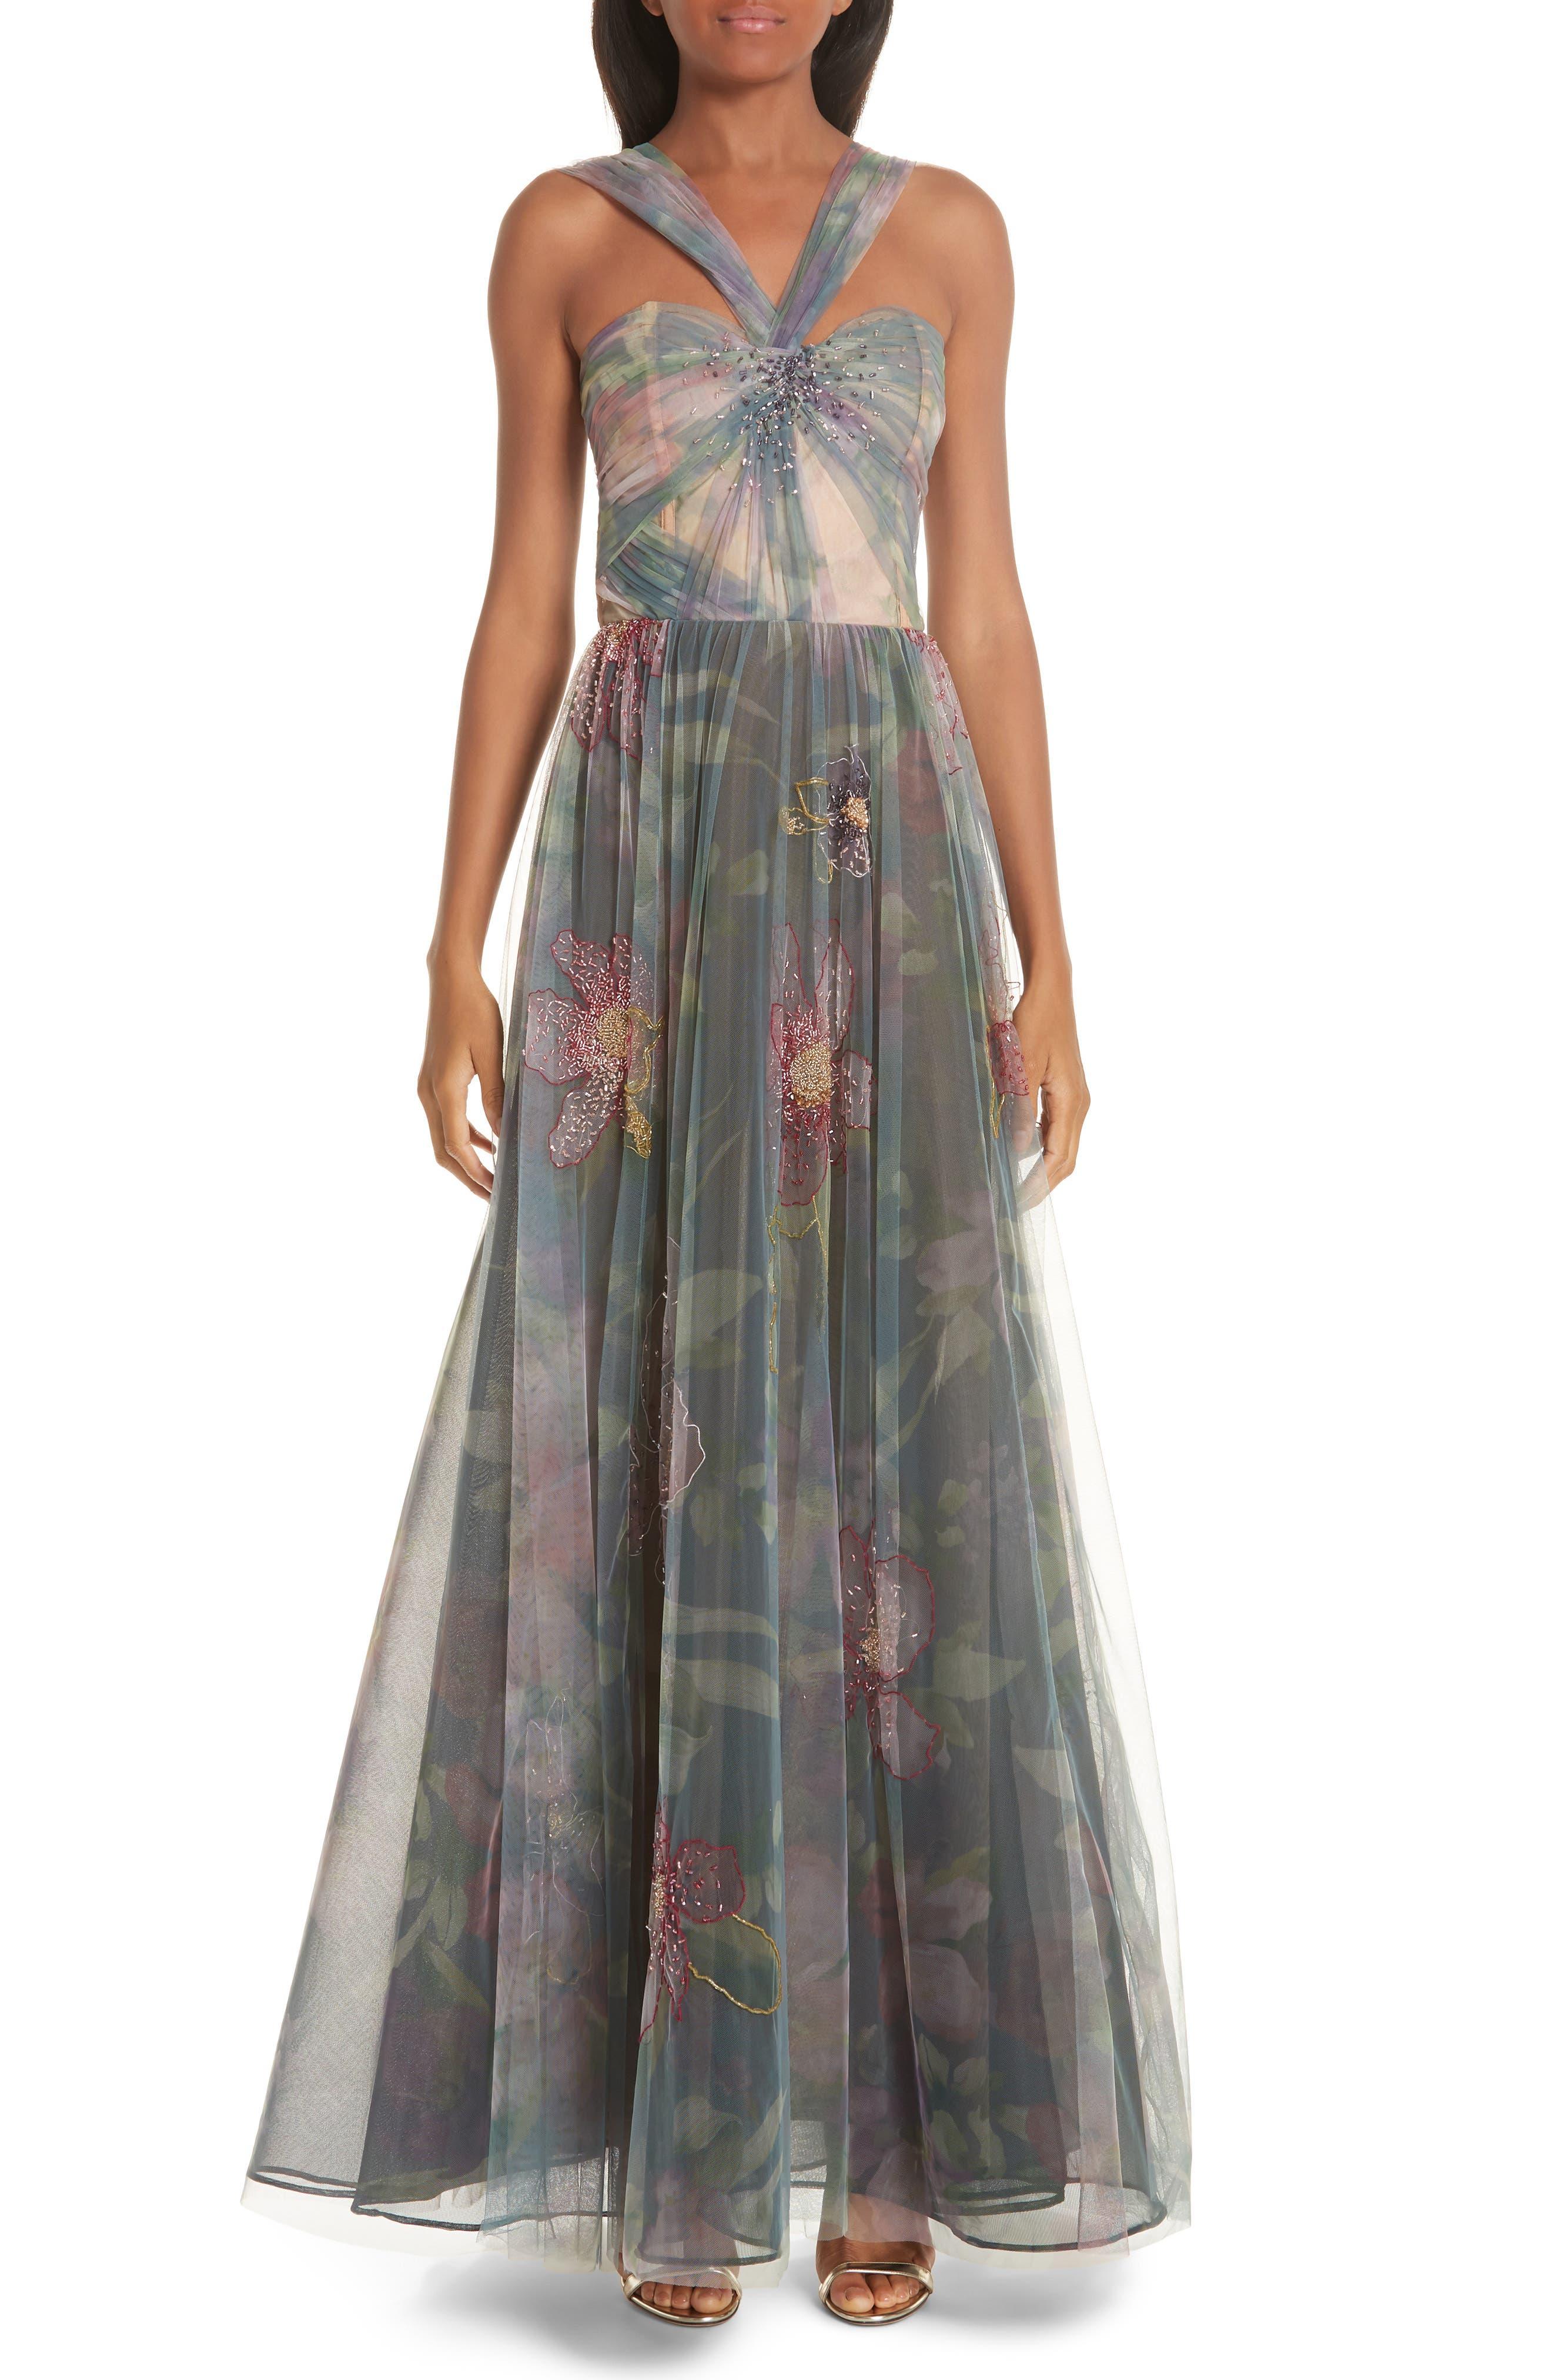 Patbo Beaded Floral Evening Dress, US / 44 BR - Blue